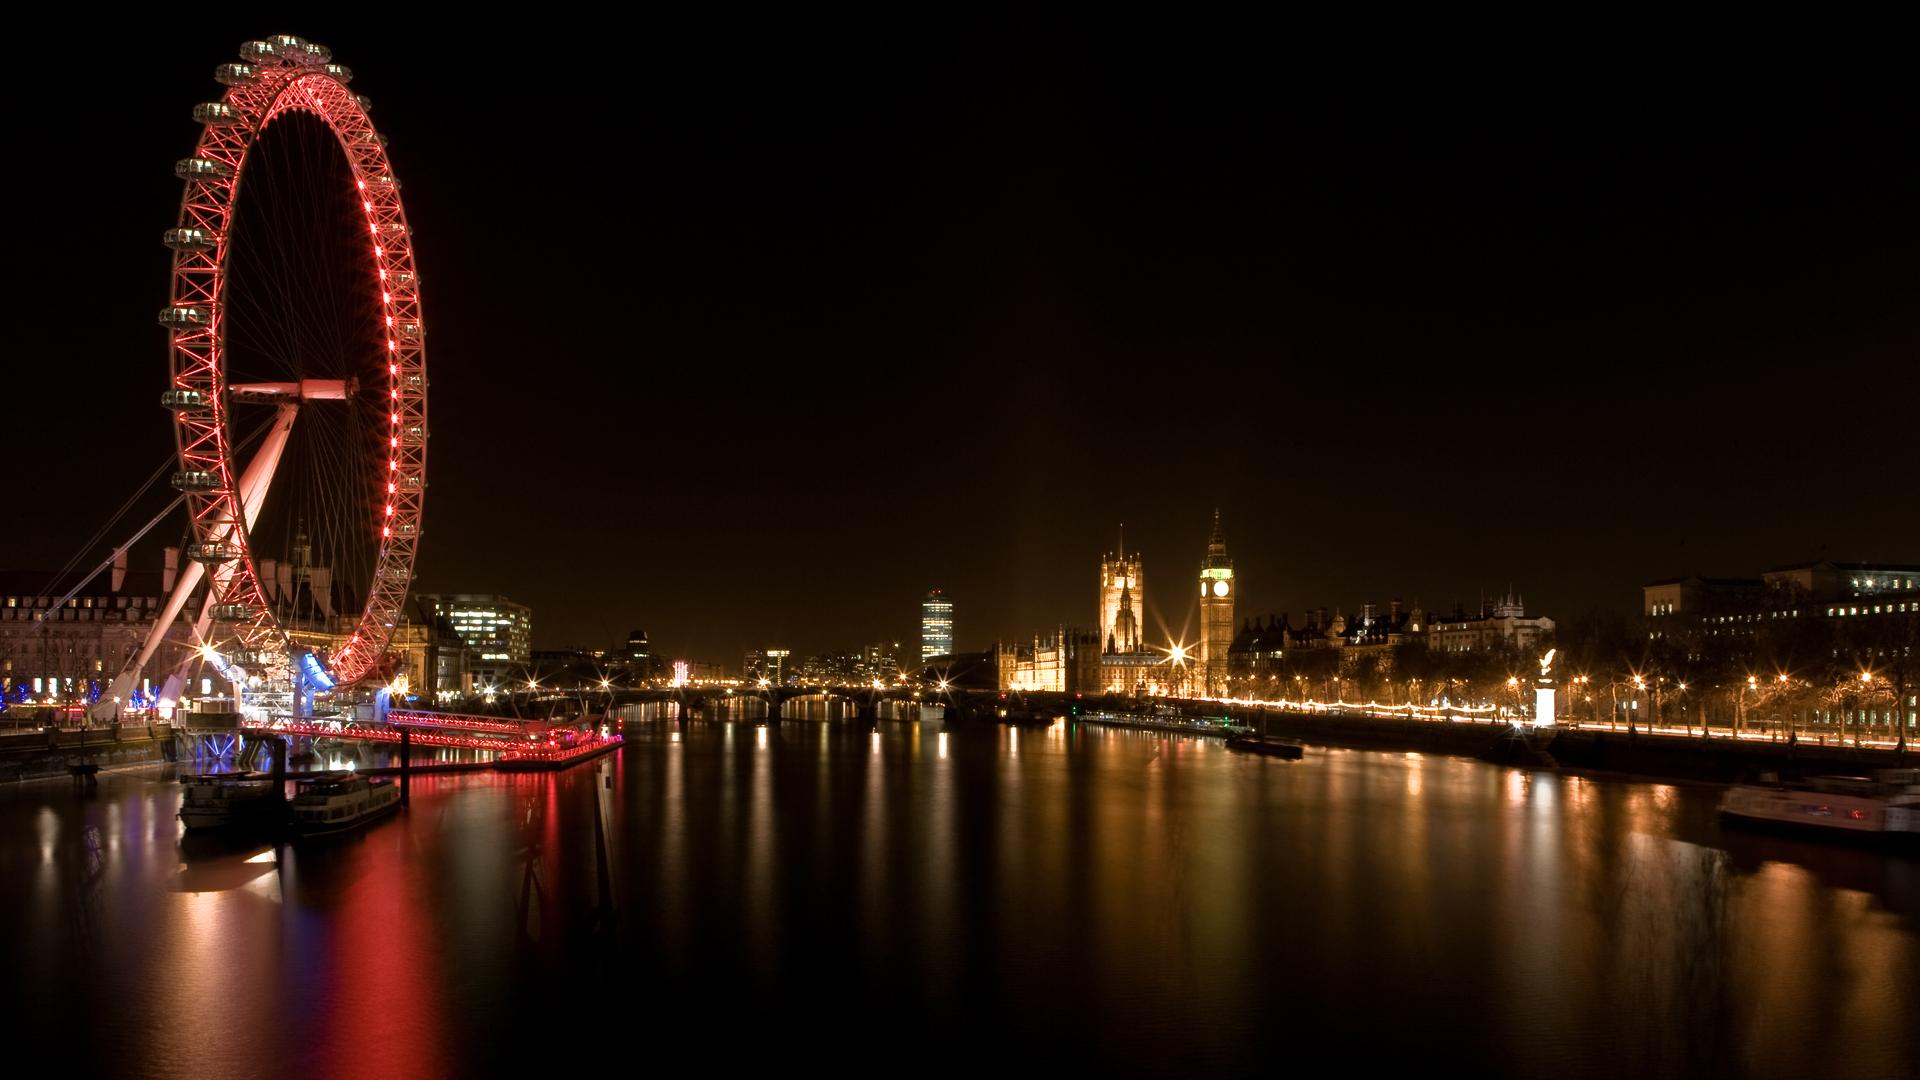 Night London City Wallpaper 1920x1080